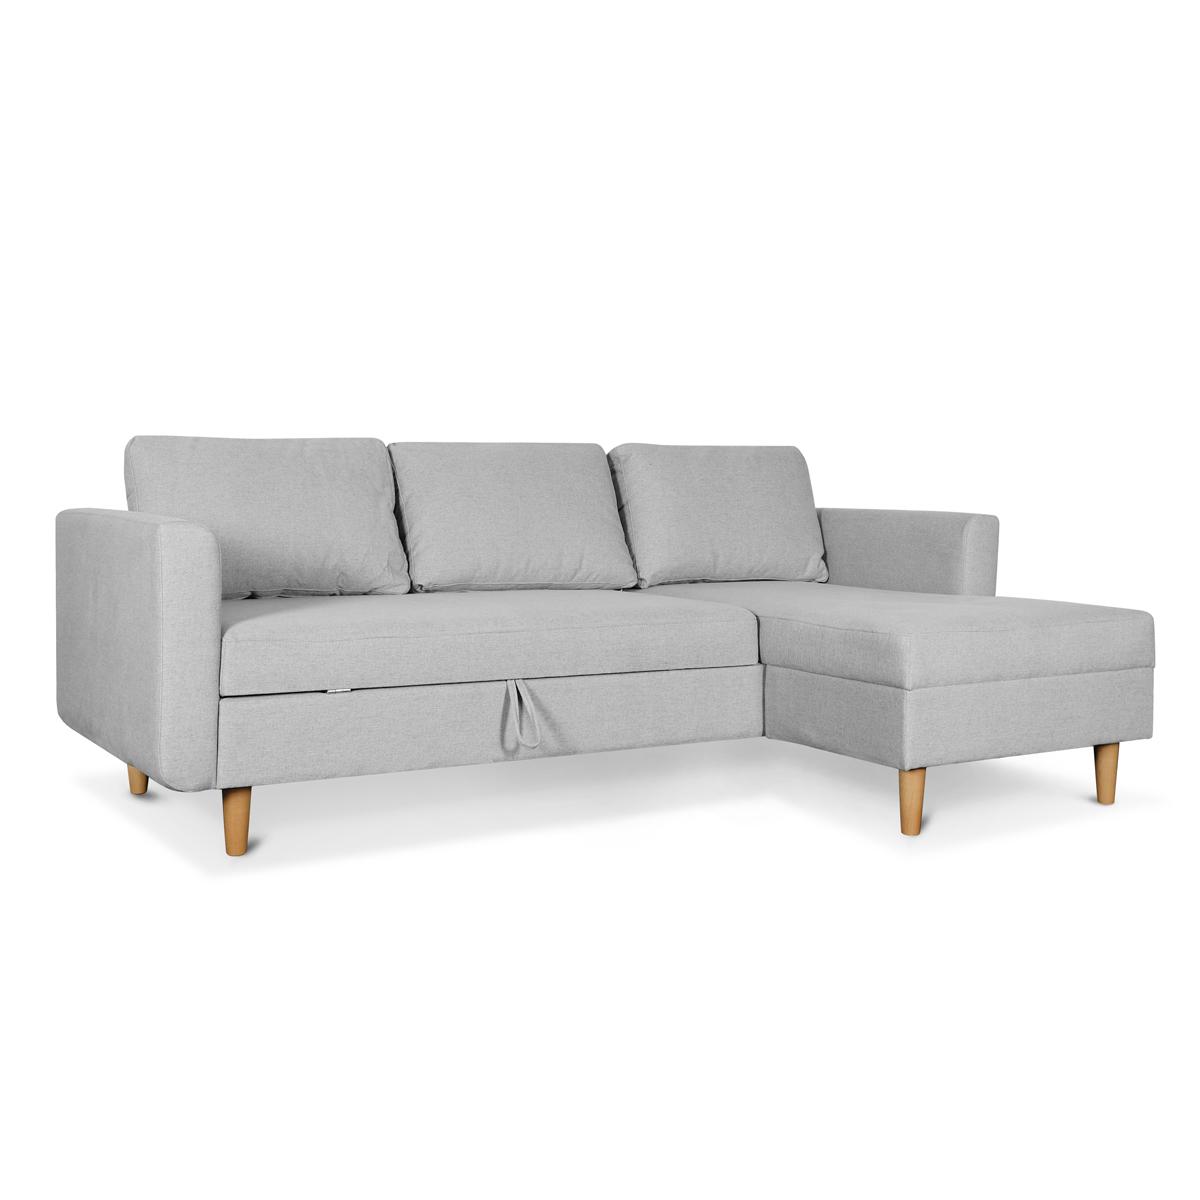 Marcel Stone Grey Left Sectional Sofa Bed Ruma